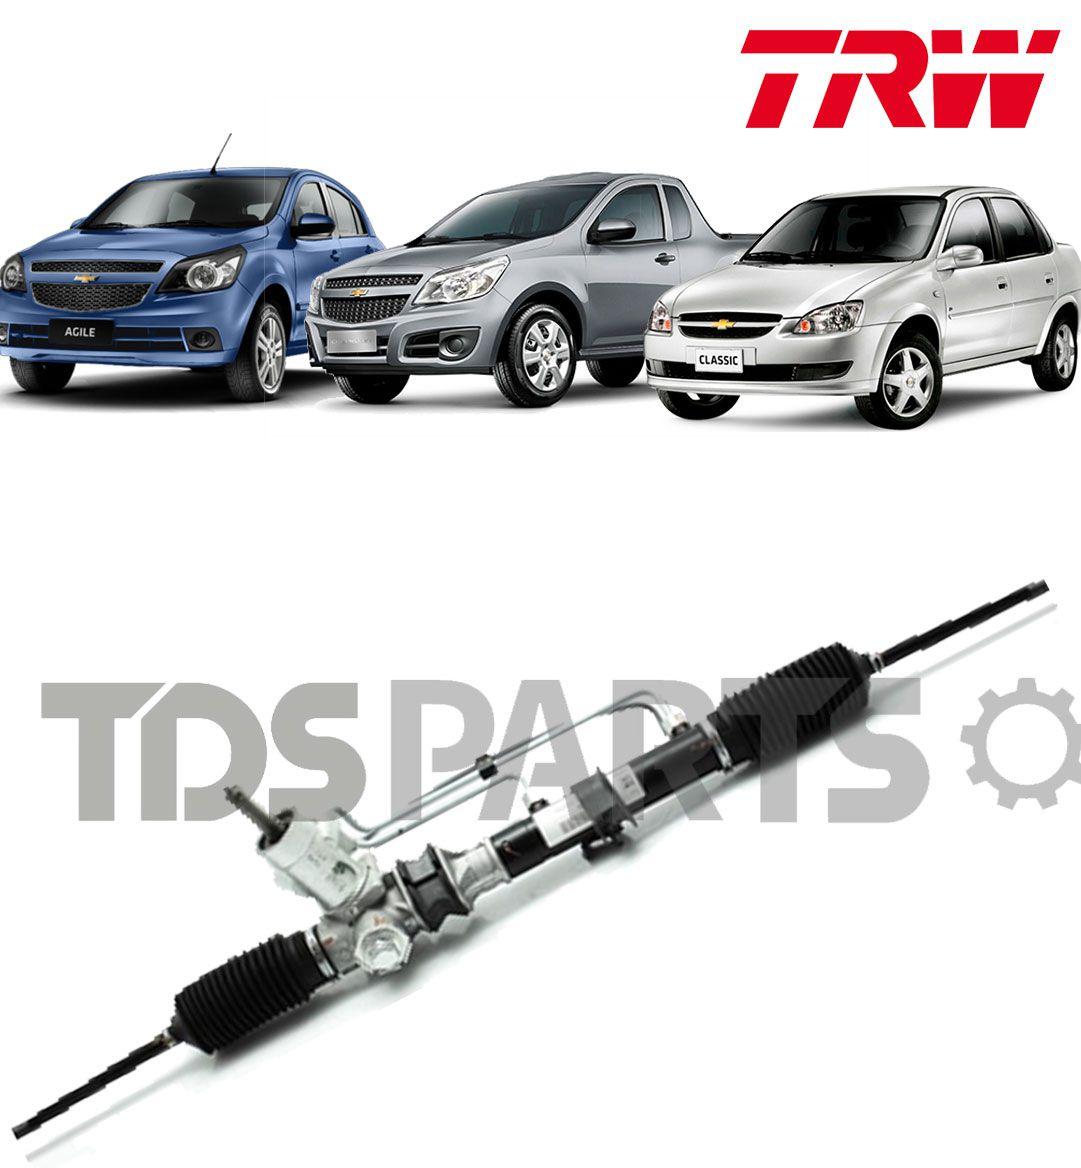 Caixa De Direção Hidráulica Corsa | Classic | Prisma | Celta | Agile | Nova Montana | Pick-Up | Wagon | Tigra